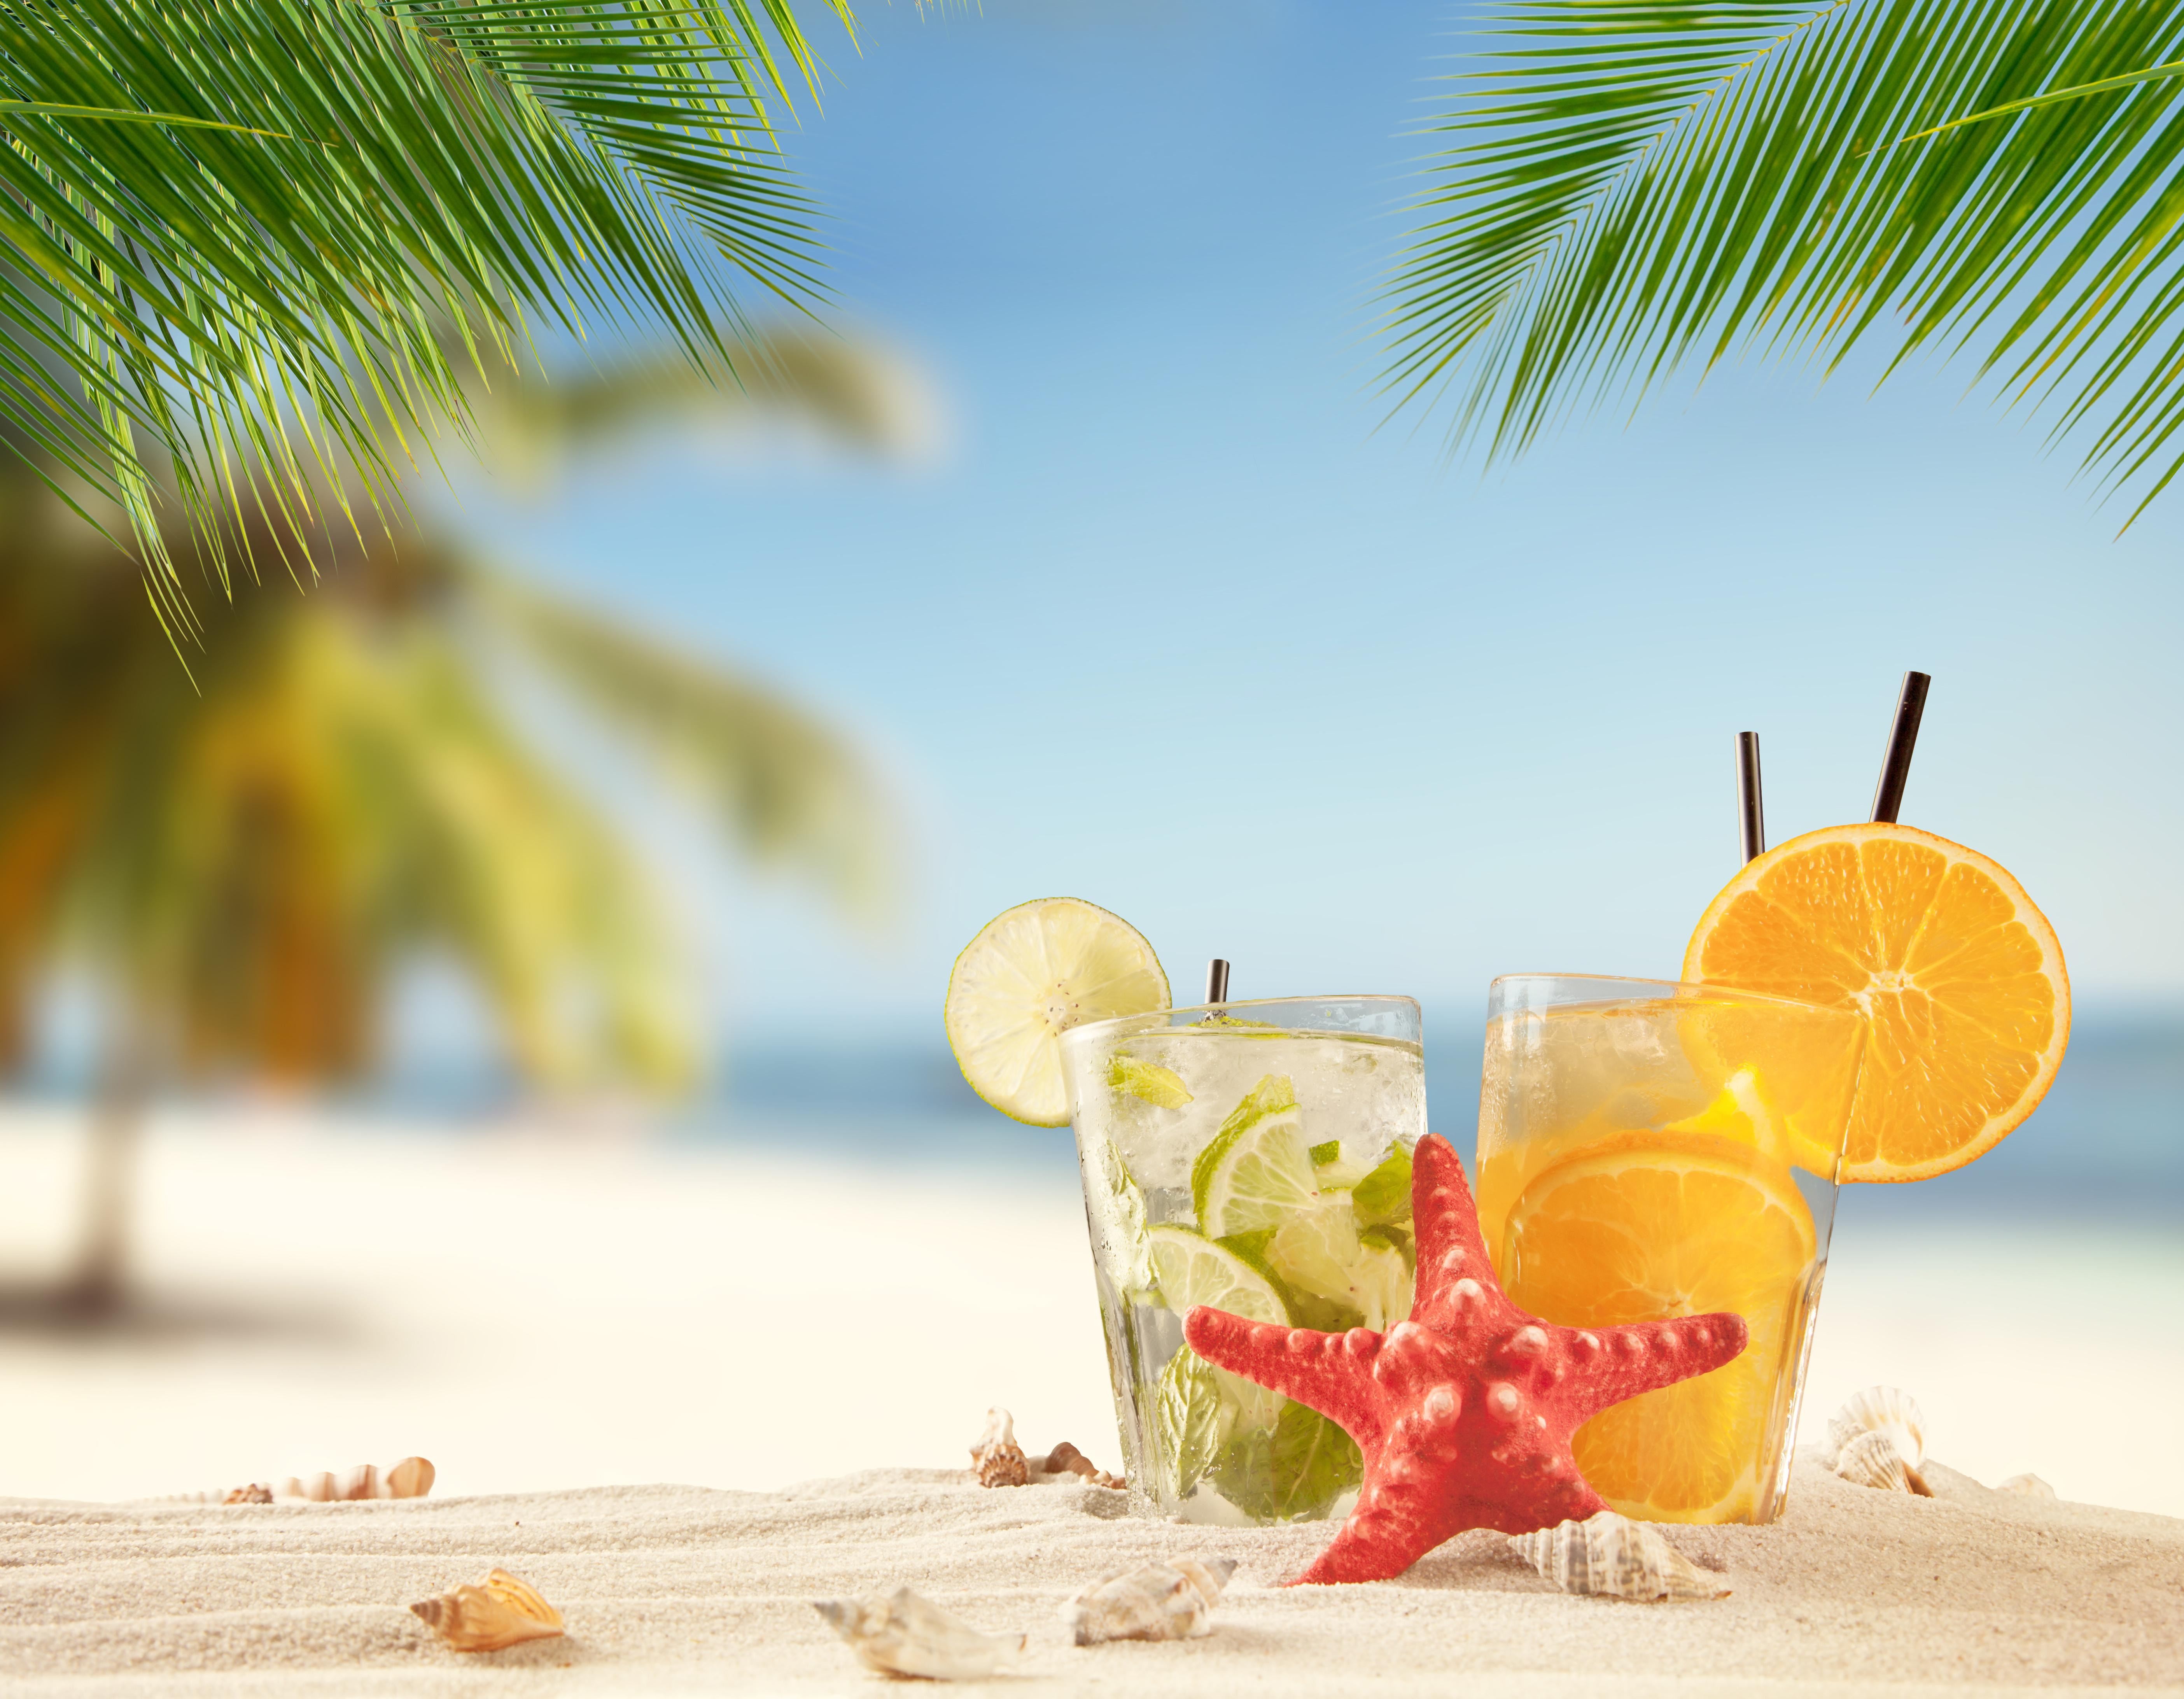 обои коктейль, напиток, мохито, апельсин картинки фото